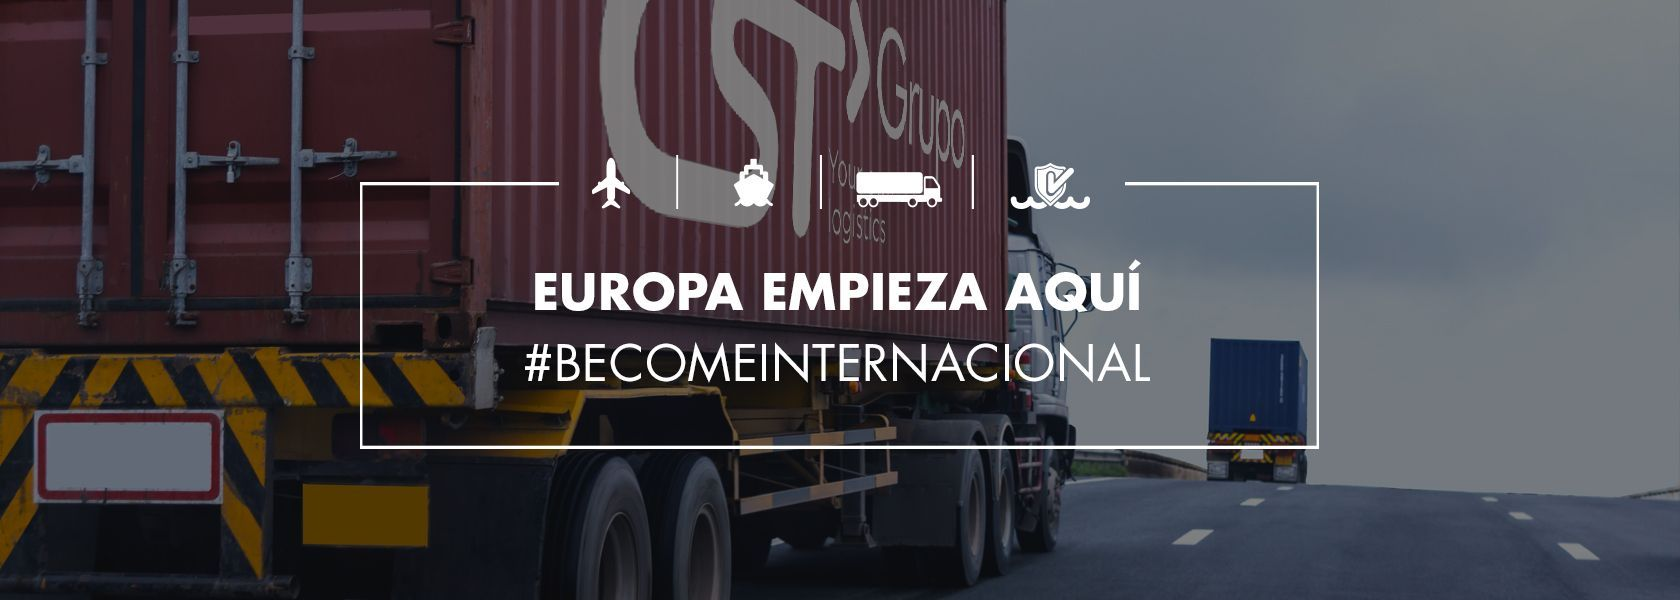 Transporte internacional de mercancías terrestre